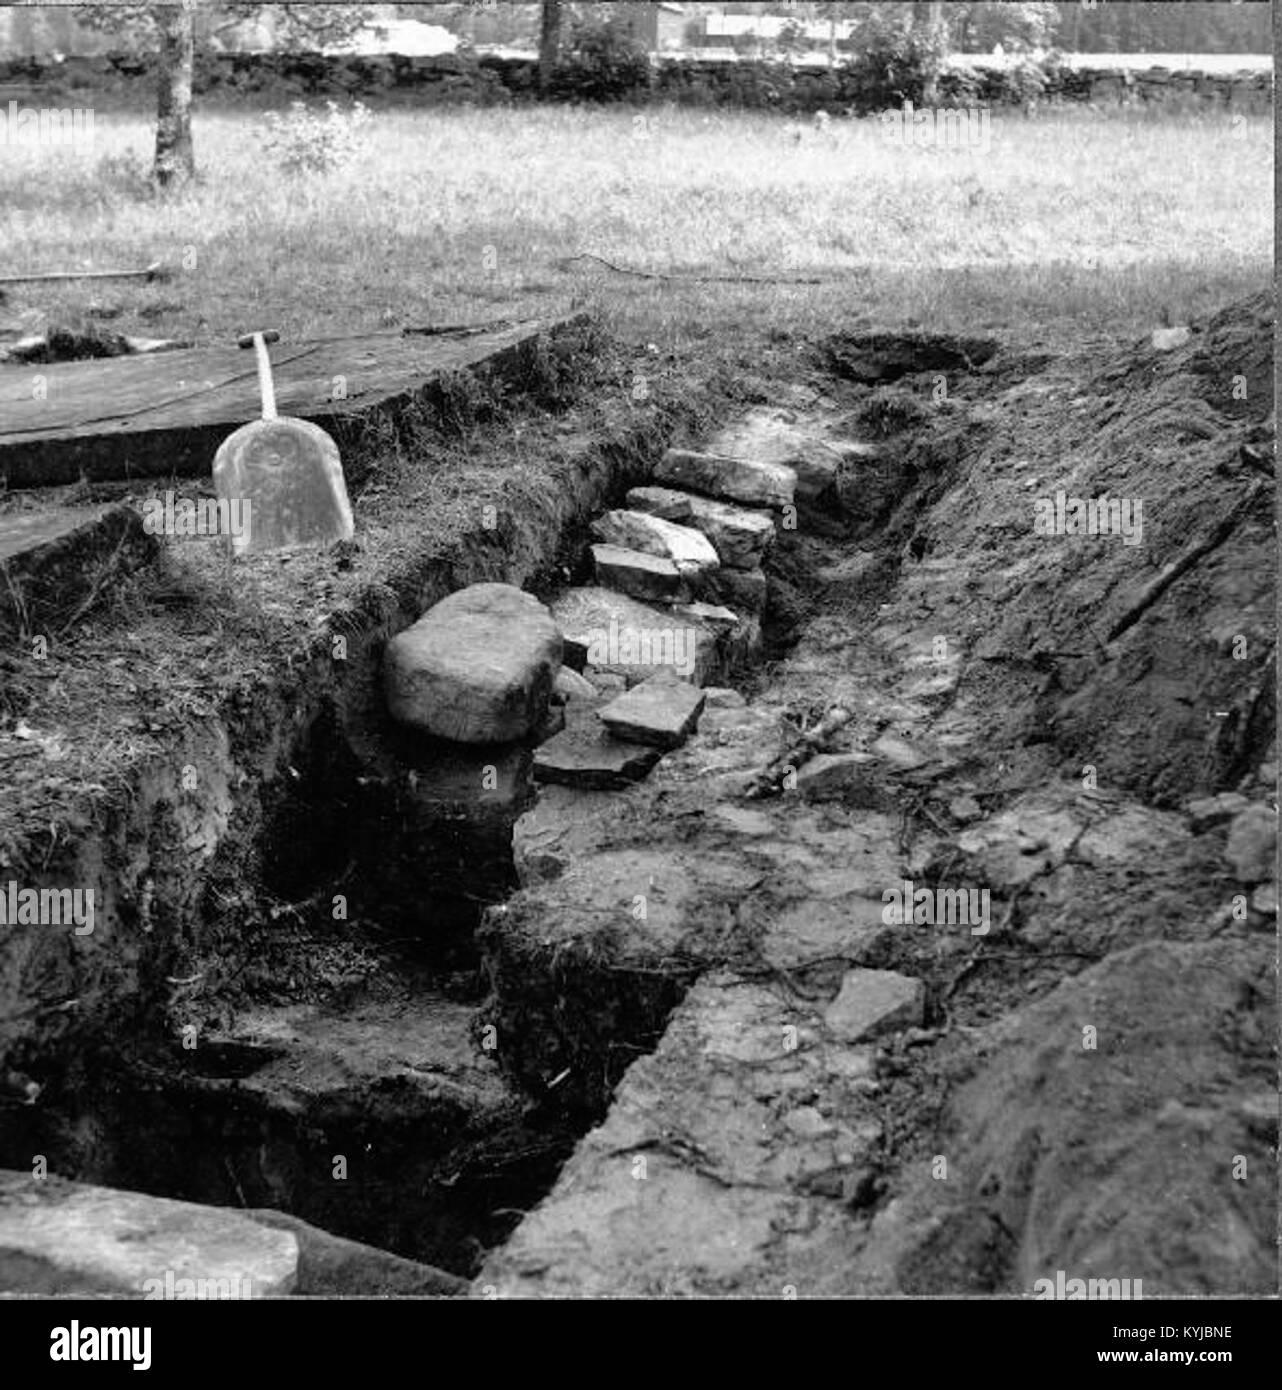 Stora Kils kyrkogrd in Kil, Vrmlands ln - Find A Grave